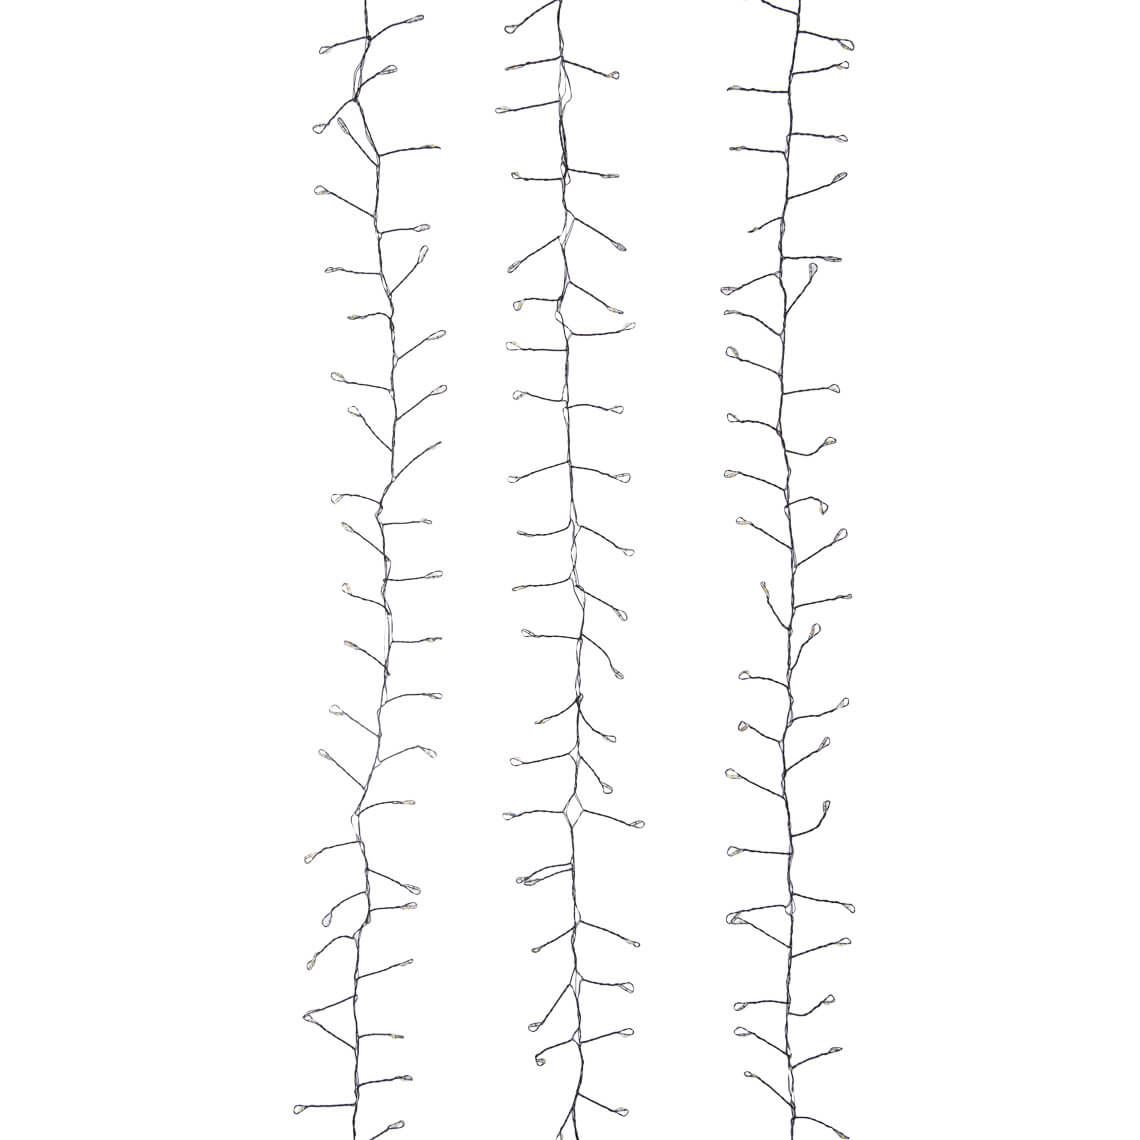 Blitzen String Lights Size W 130cm x D 7cm x H 7cm in Black Plastic/Metal Freedom